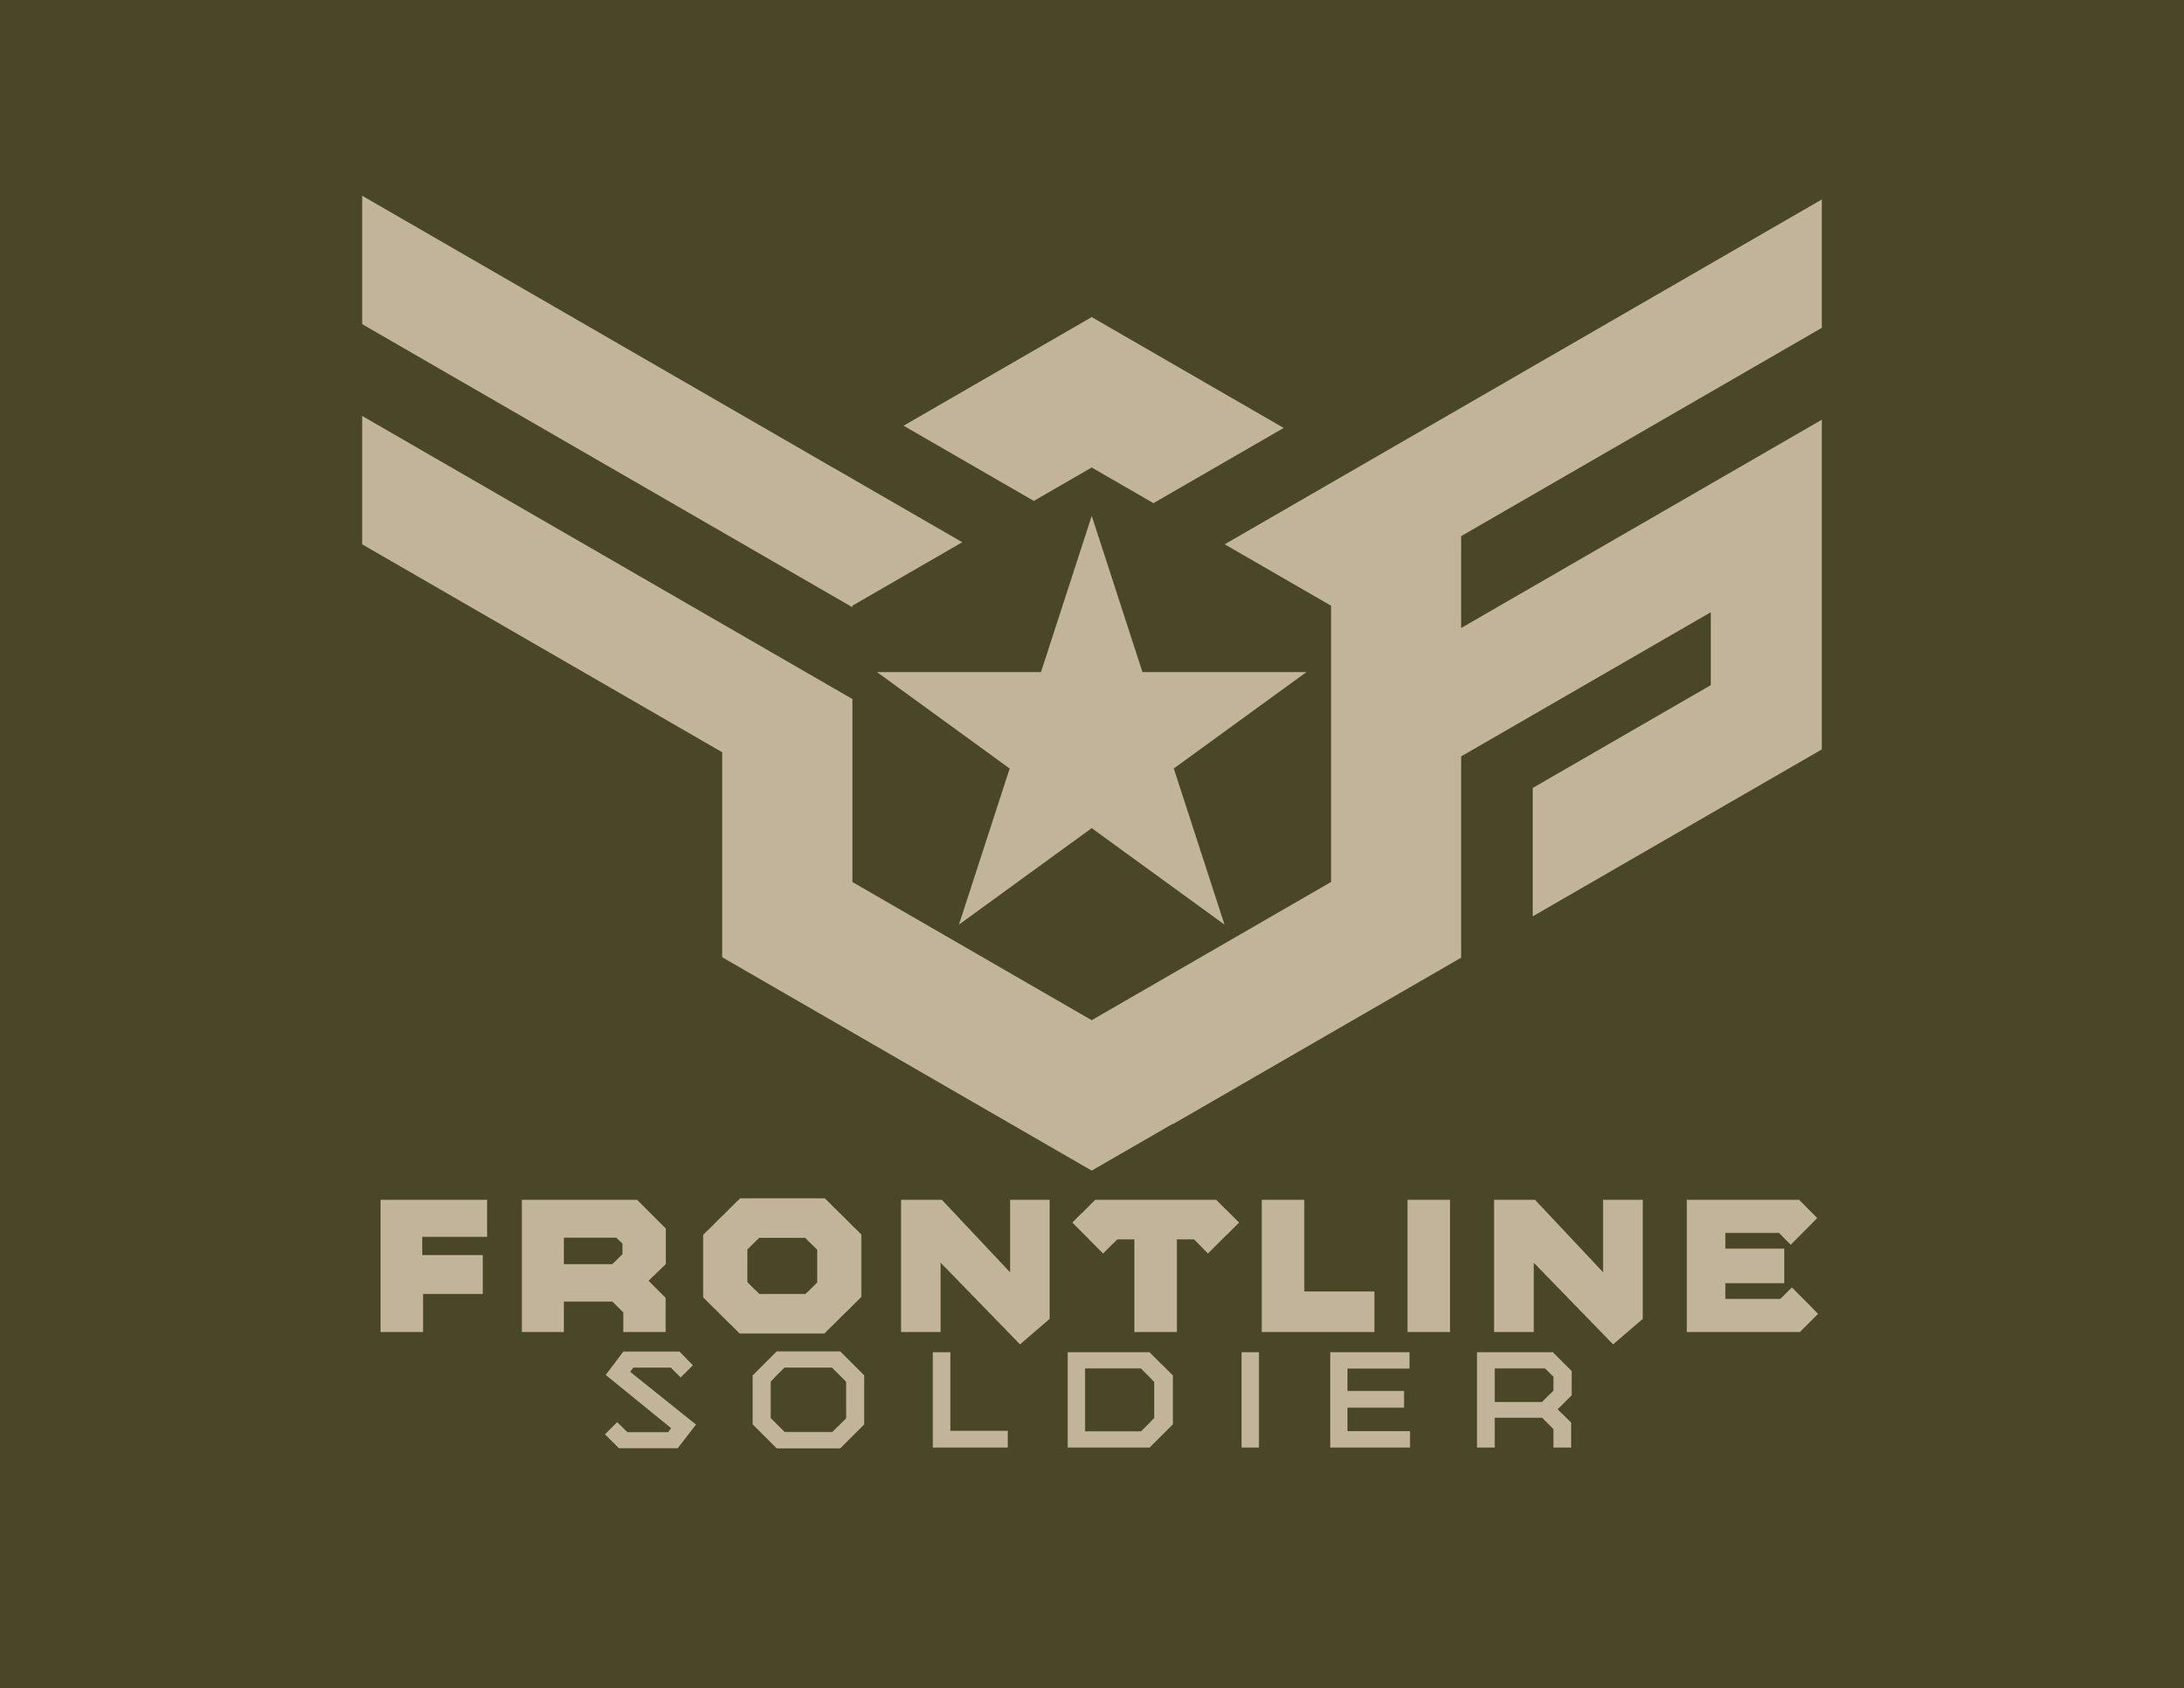 FrontlineSoldier-Sand.jpg